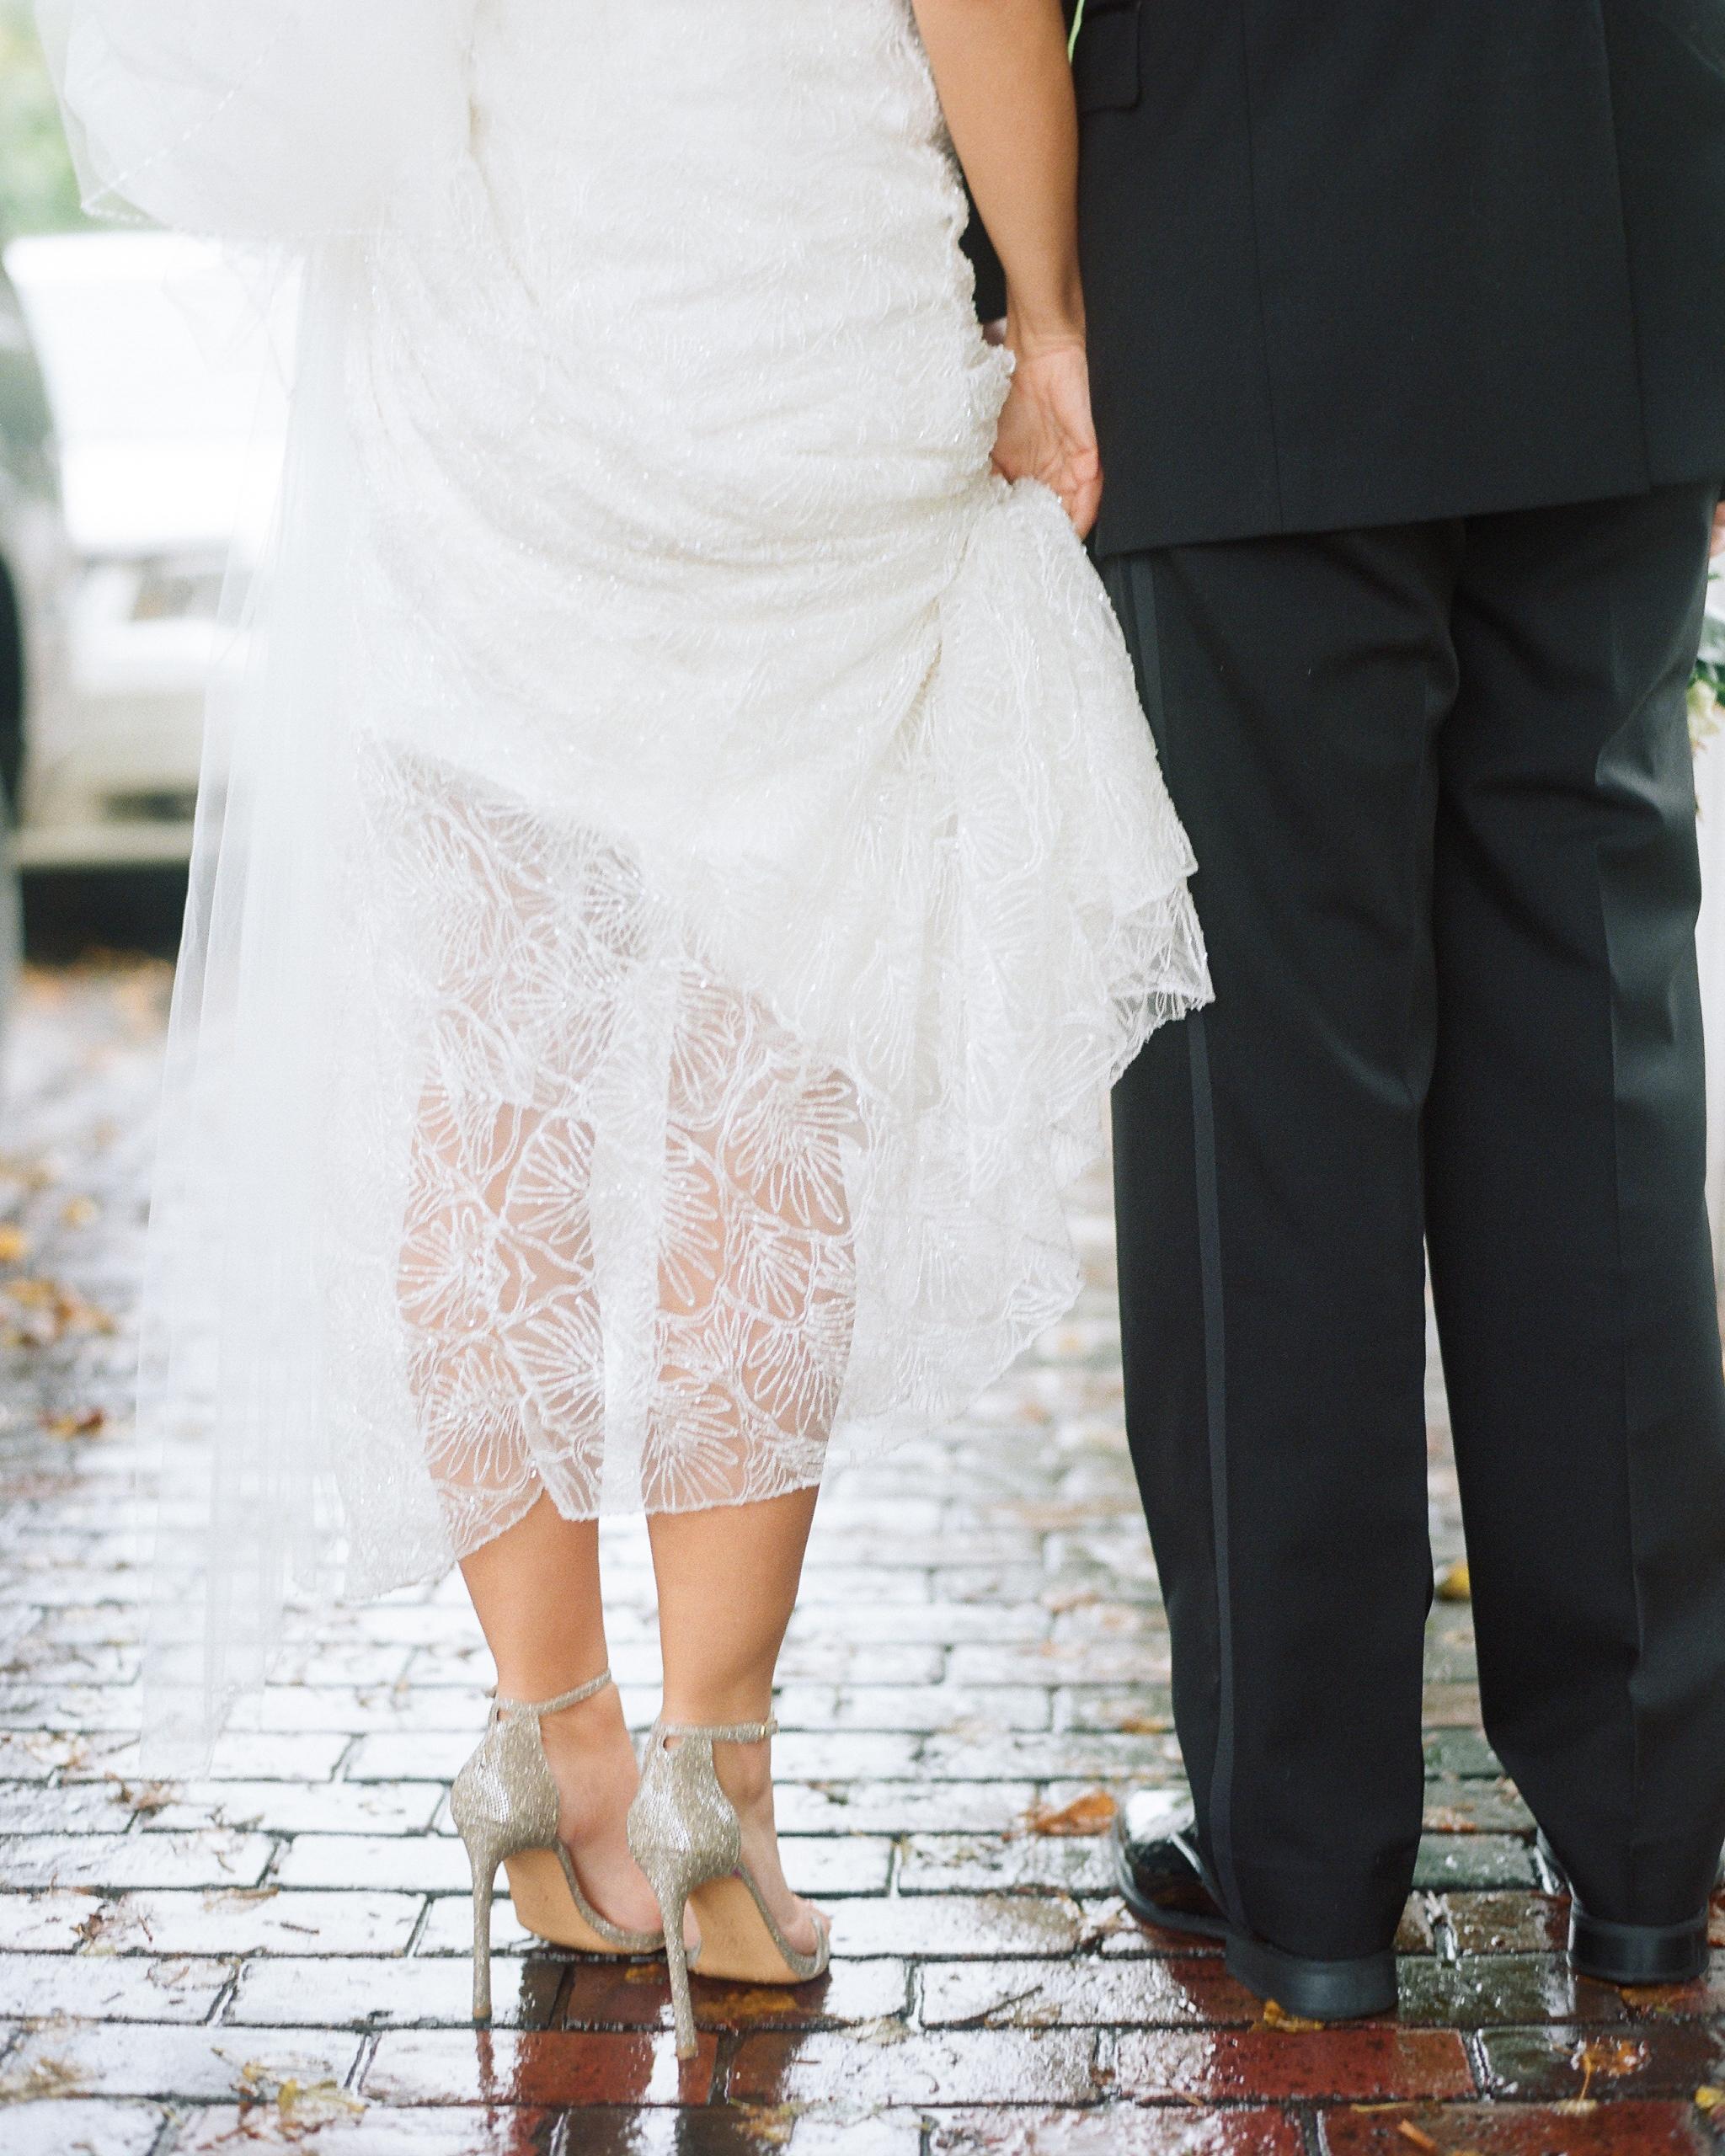 lindsay-garrett-wedding-shoes-0610-s111850-0415.jpg